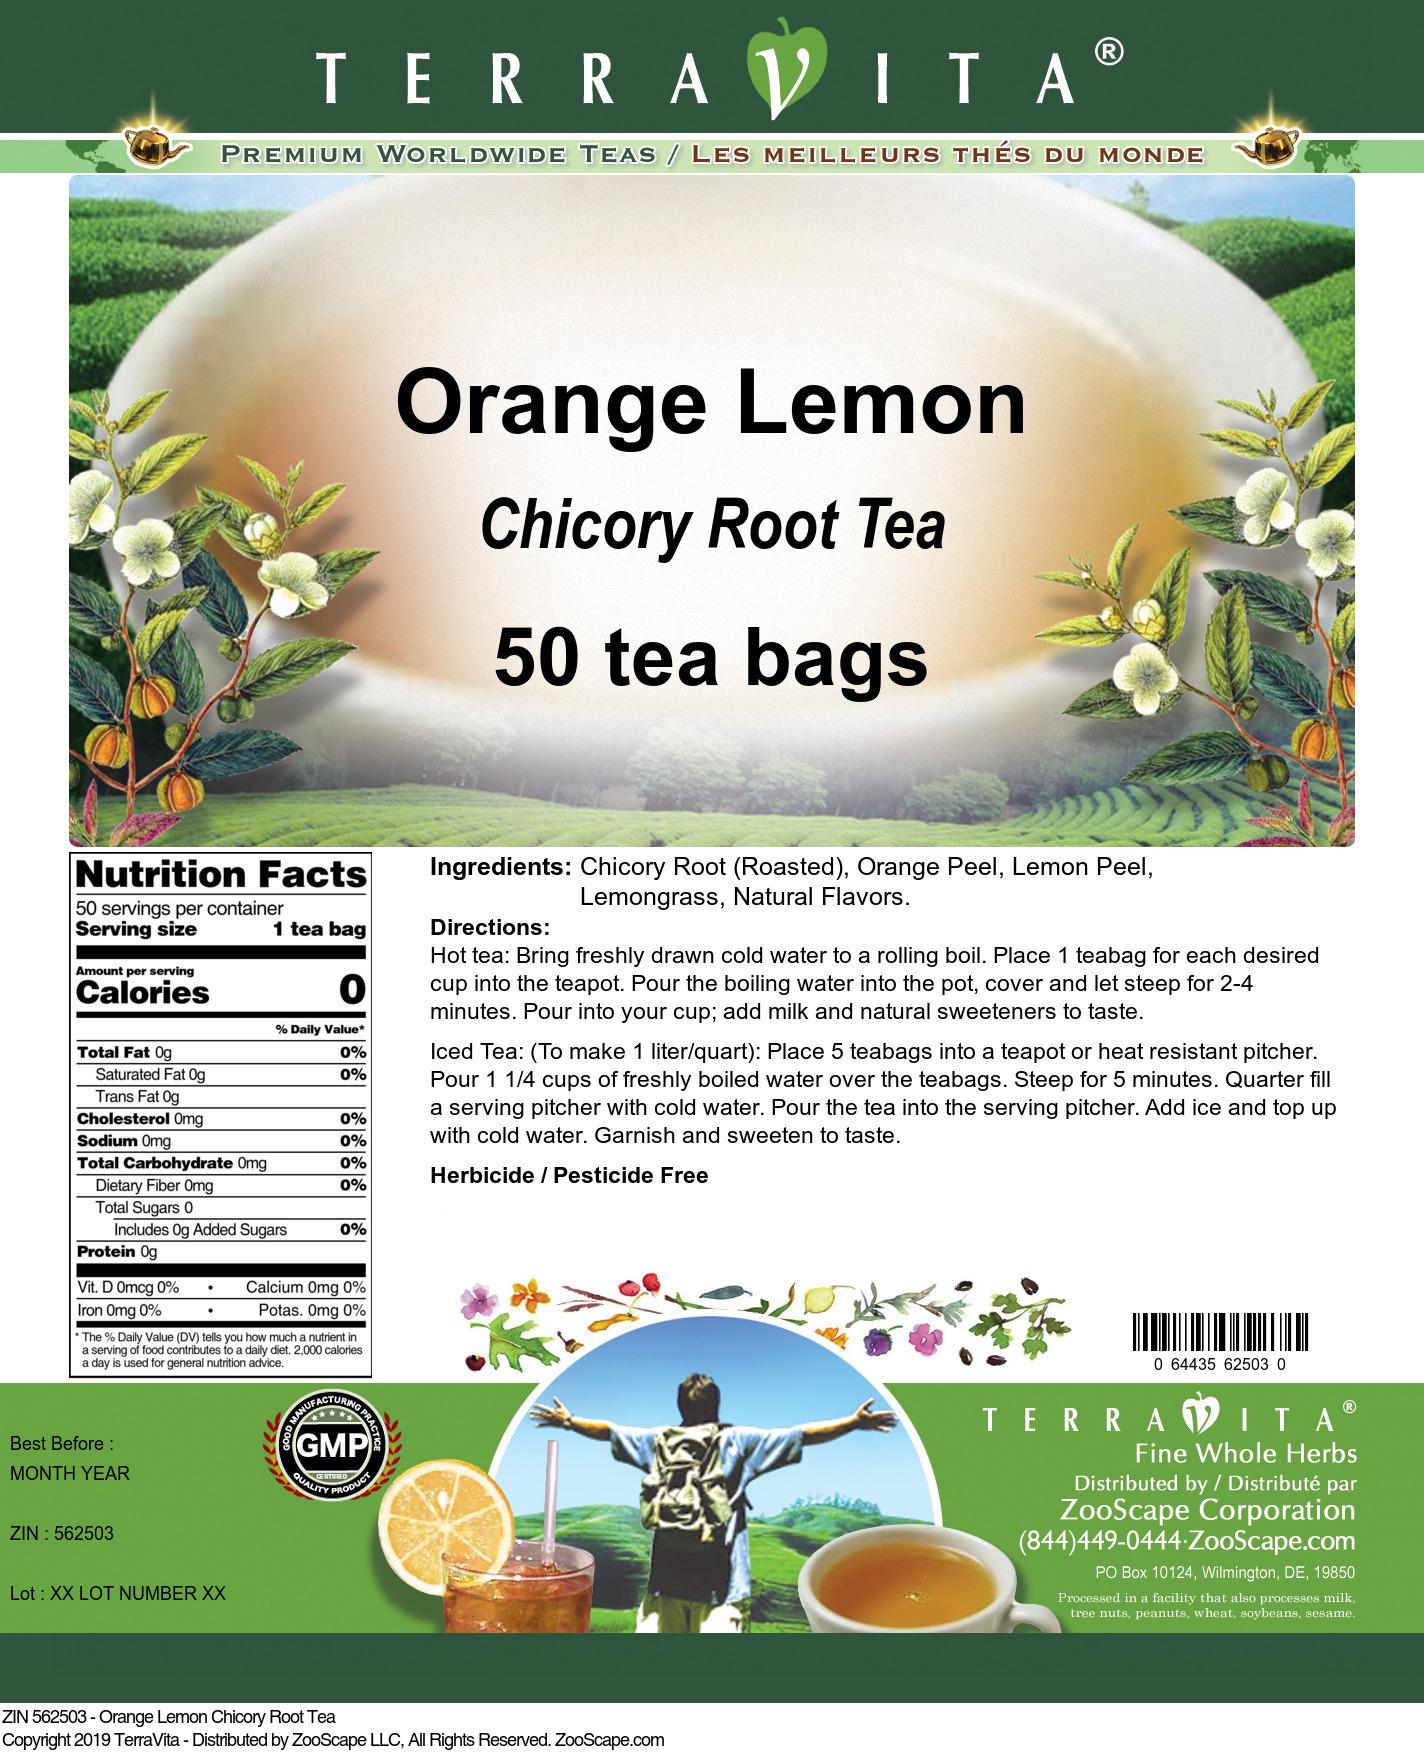 Orange Lemon Chicory Root